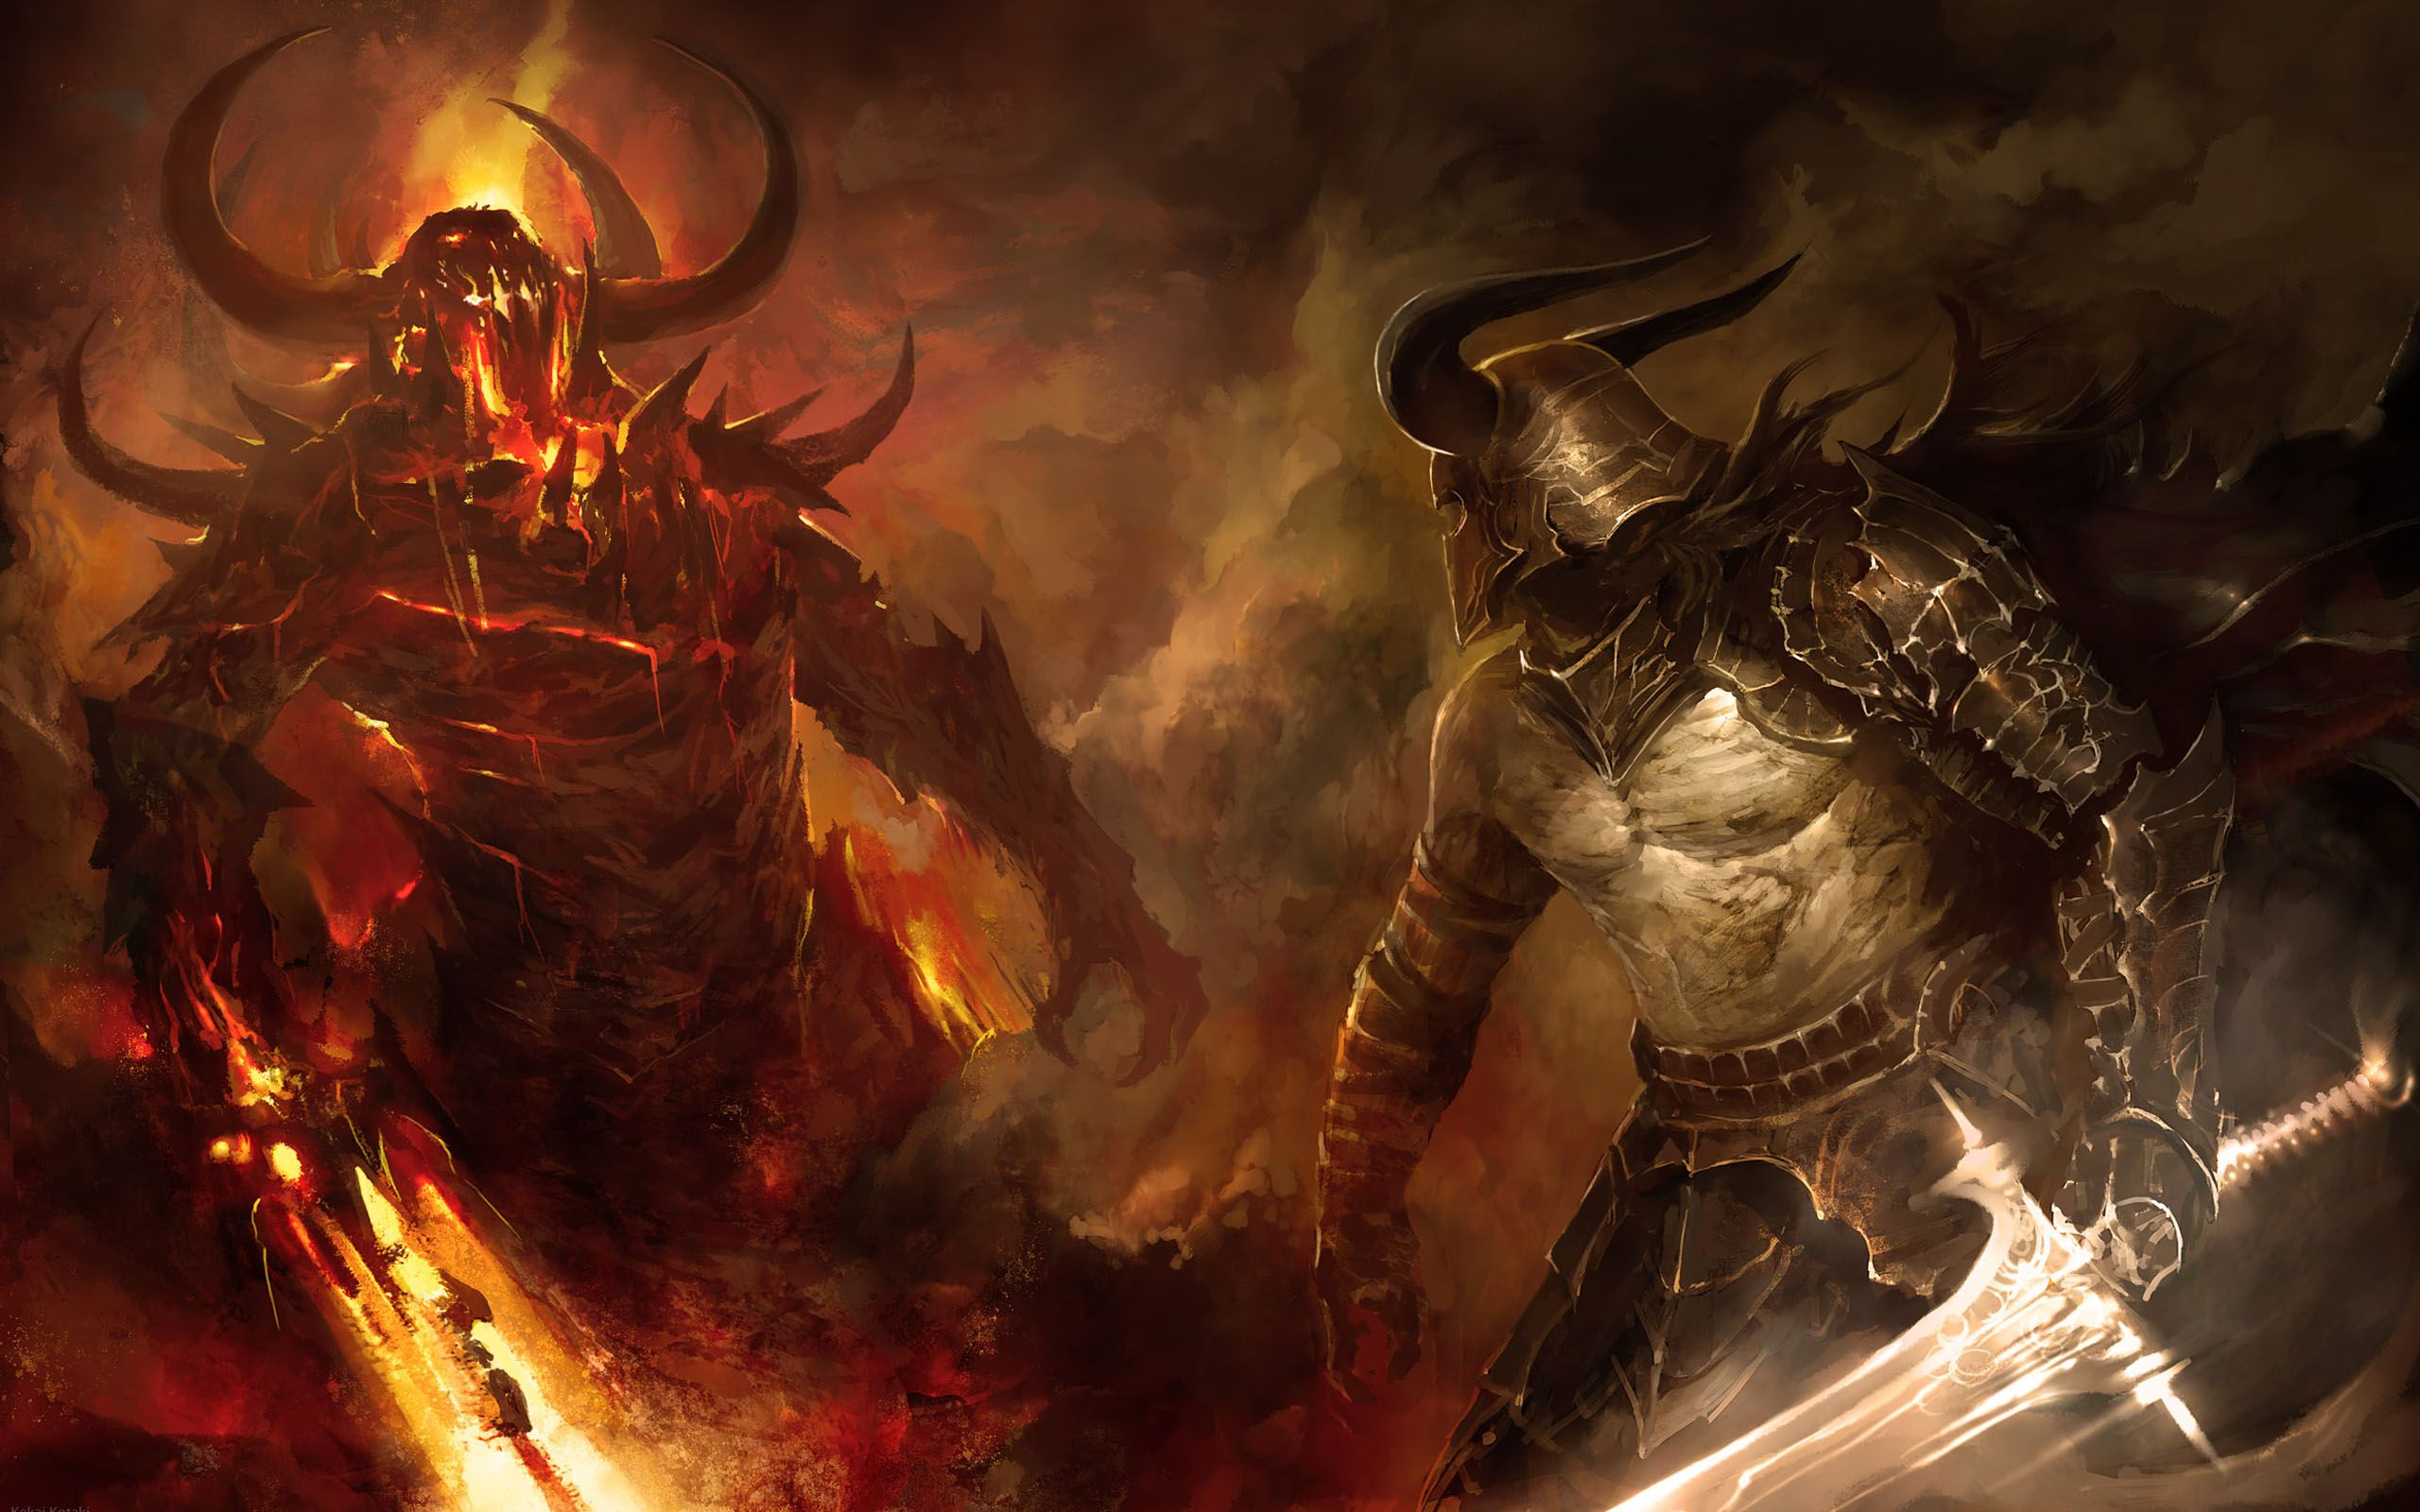 Download Dark Warrior Wallpaper 2560x1600 Wallpoper 222388 2560x1600